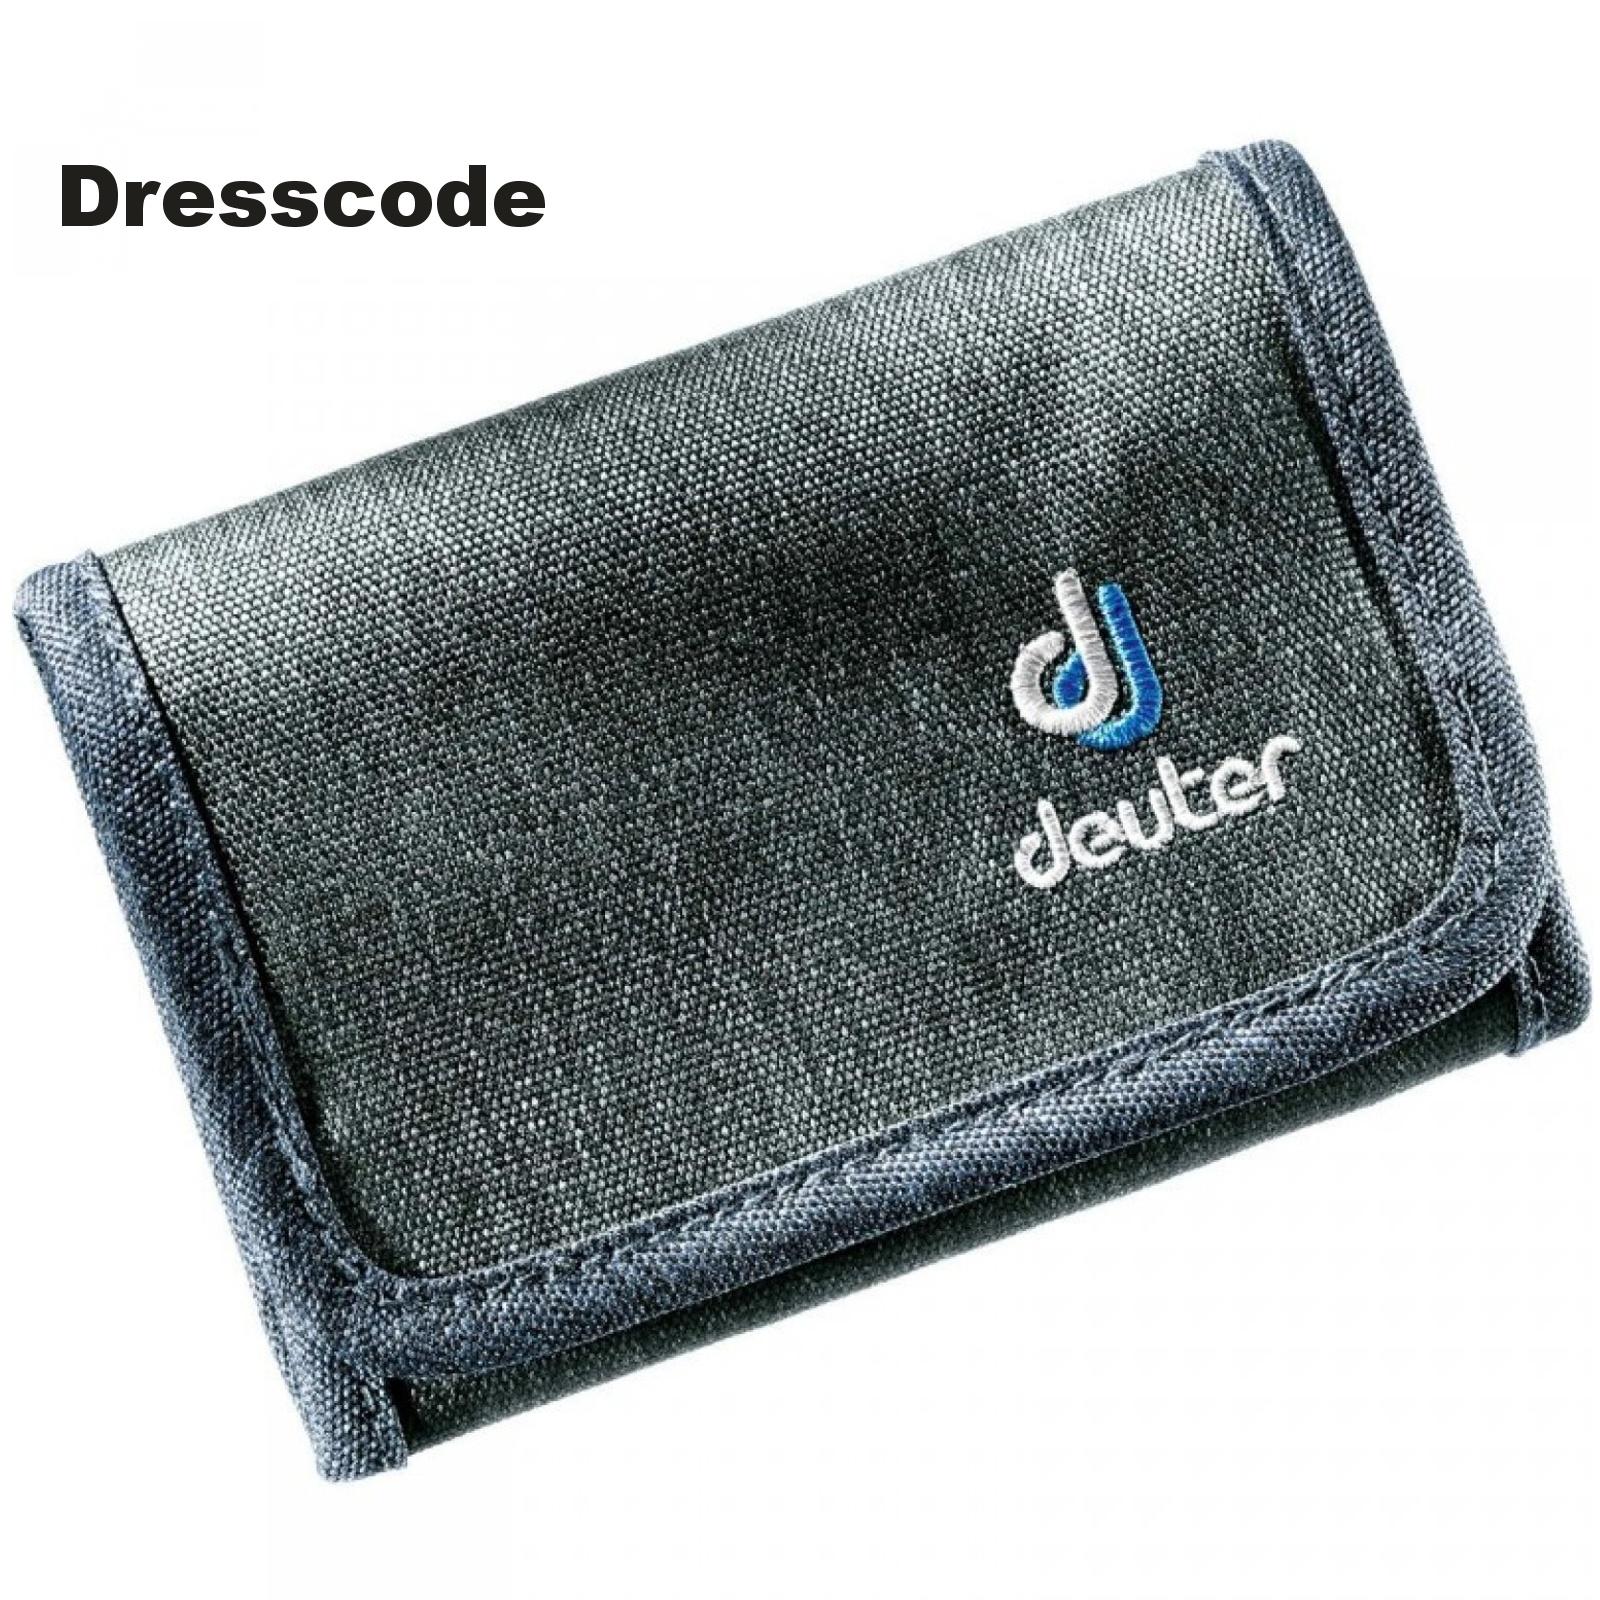 Deuter Travel peňaženka Midnight Dresscode